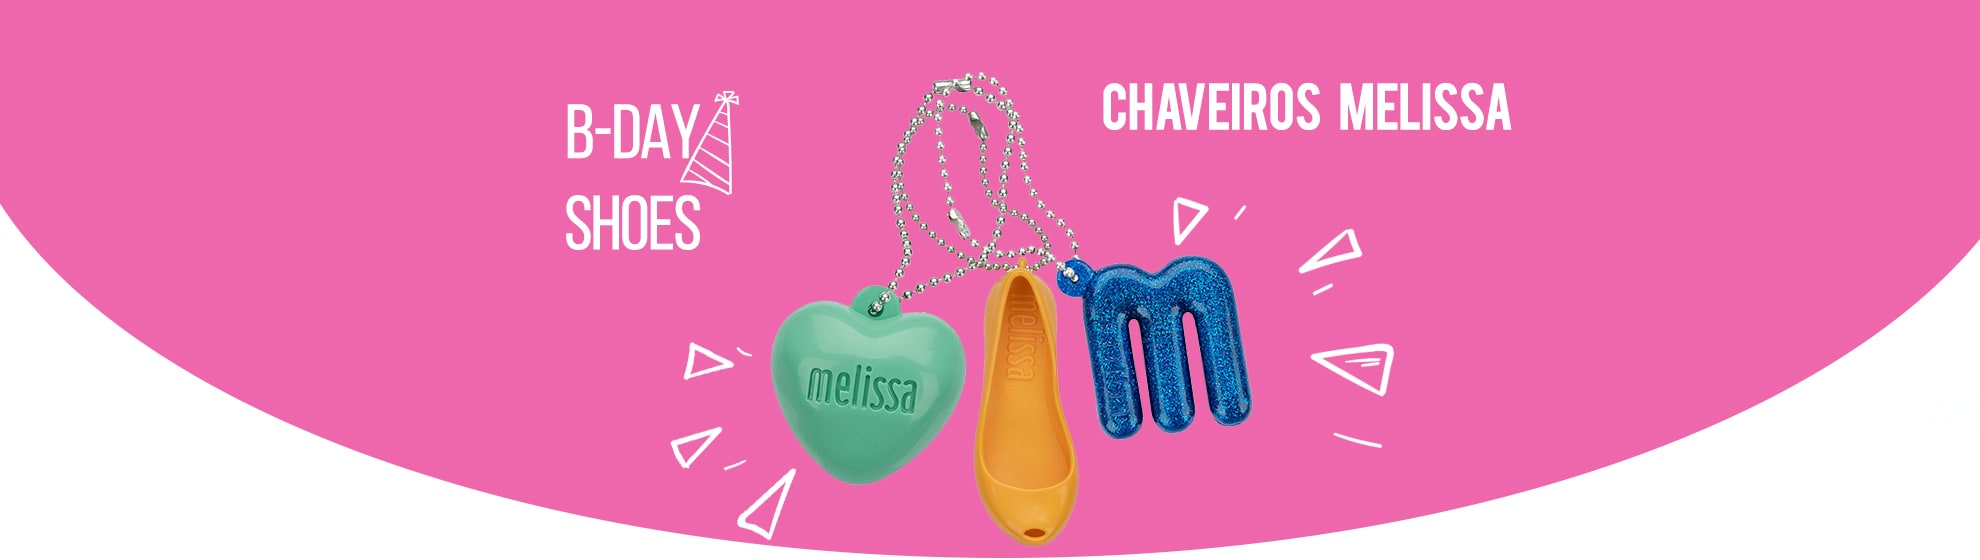 Chaveiro Melissa